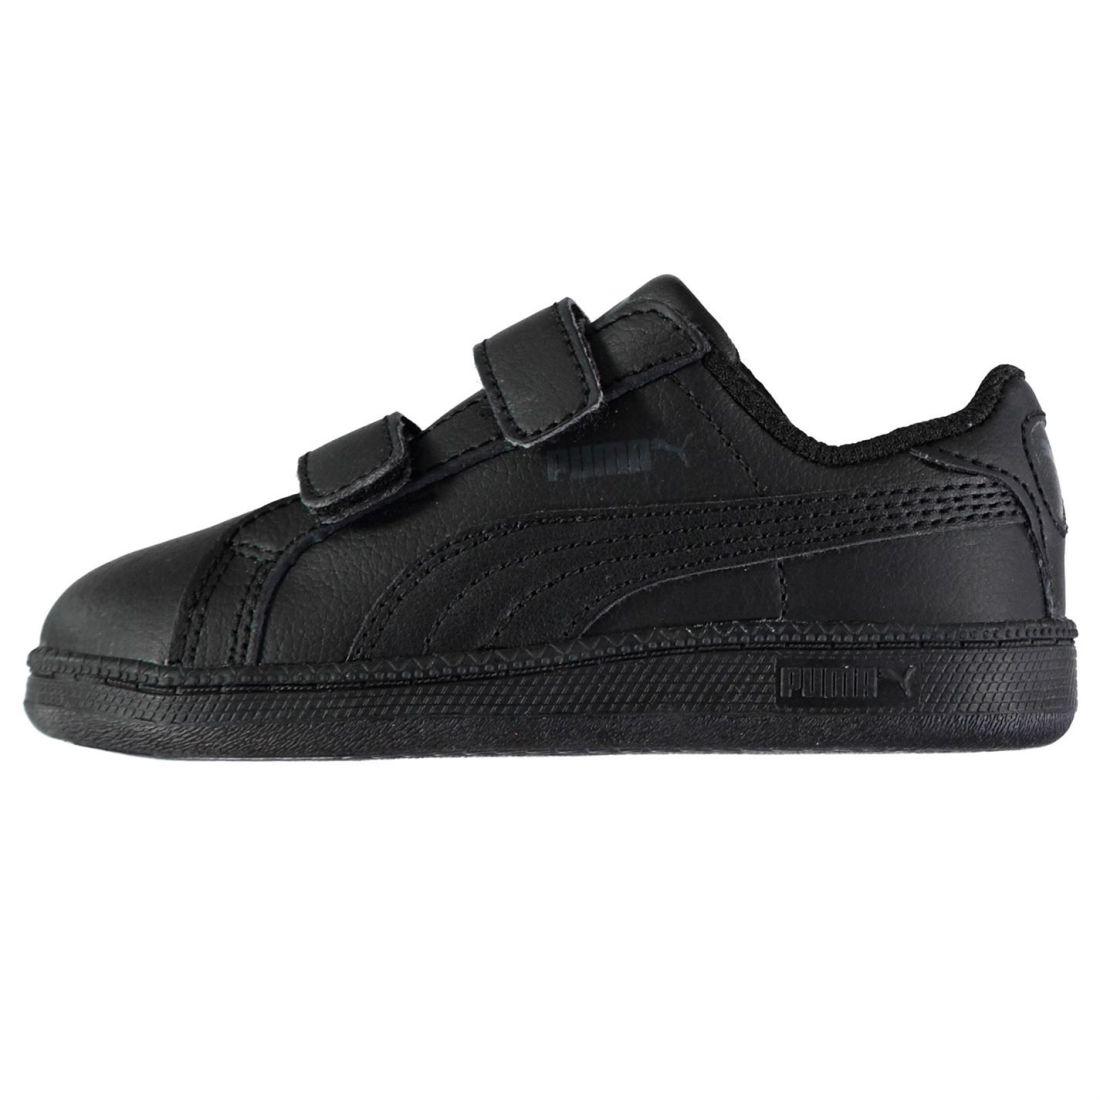 Details about Puma Kids Smash Suede Fun Court Trainers Infant Boys Shoes  Touch and Close Strap 5d0c24d101b10